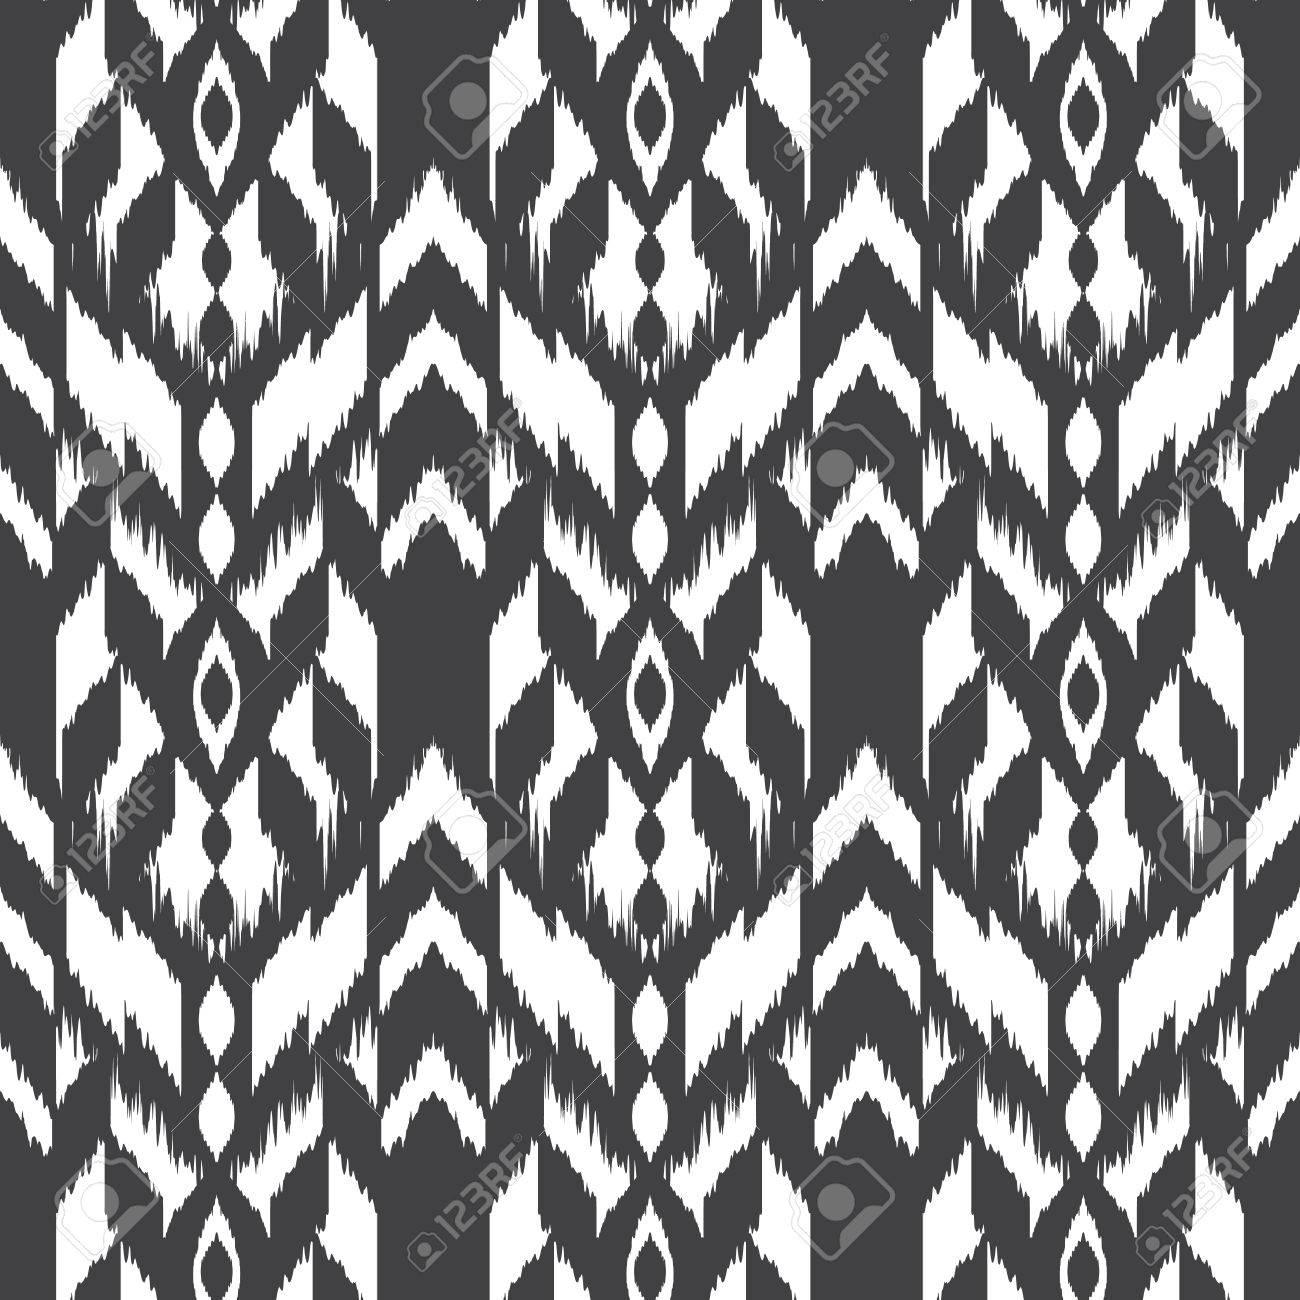 Navajo Wallpaper Home Design on crystal design wallpaper, anchor design wallpaper, latin design wallpaper, samoan design wallpaper, scout design wallpaper, native american design wallpaper, pendleton design wallpaper, irish design wallpaper, navajo indian designs, hopi design wallpaper, portuguese design wallpaper, new mexico design wallpaper, navajo border designs, navajo women's clothing, mayan design wallpaper, aztec design wallpaper, navajo rug designs, hindi design wallpaper, sioux design wallpaper, globe design wallpaper,